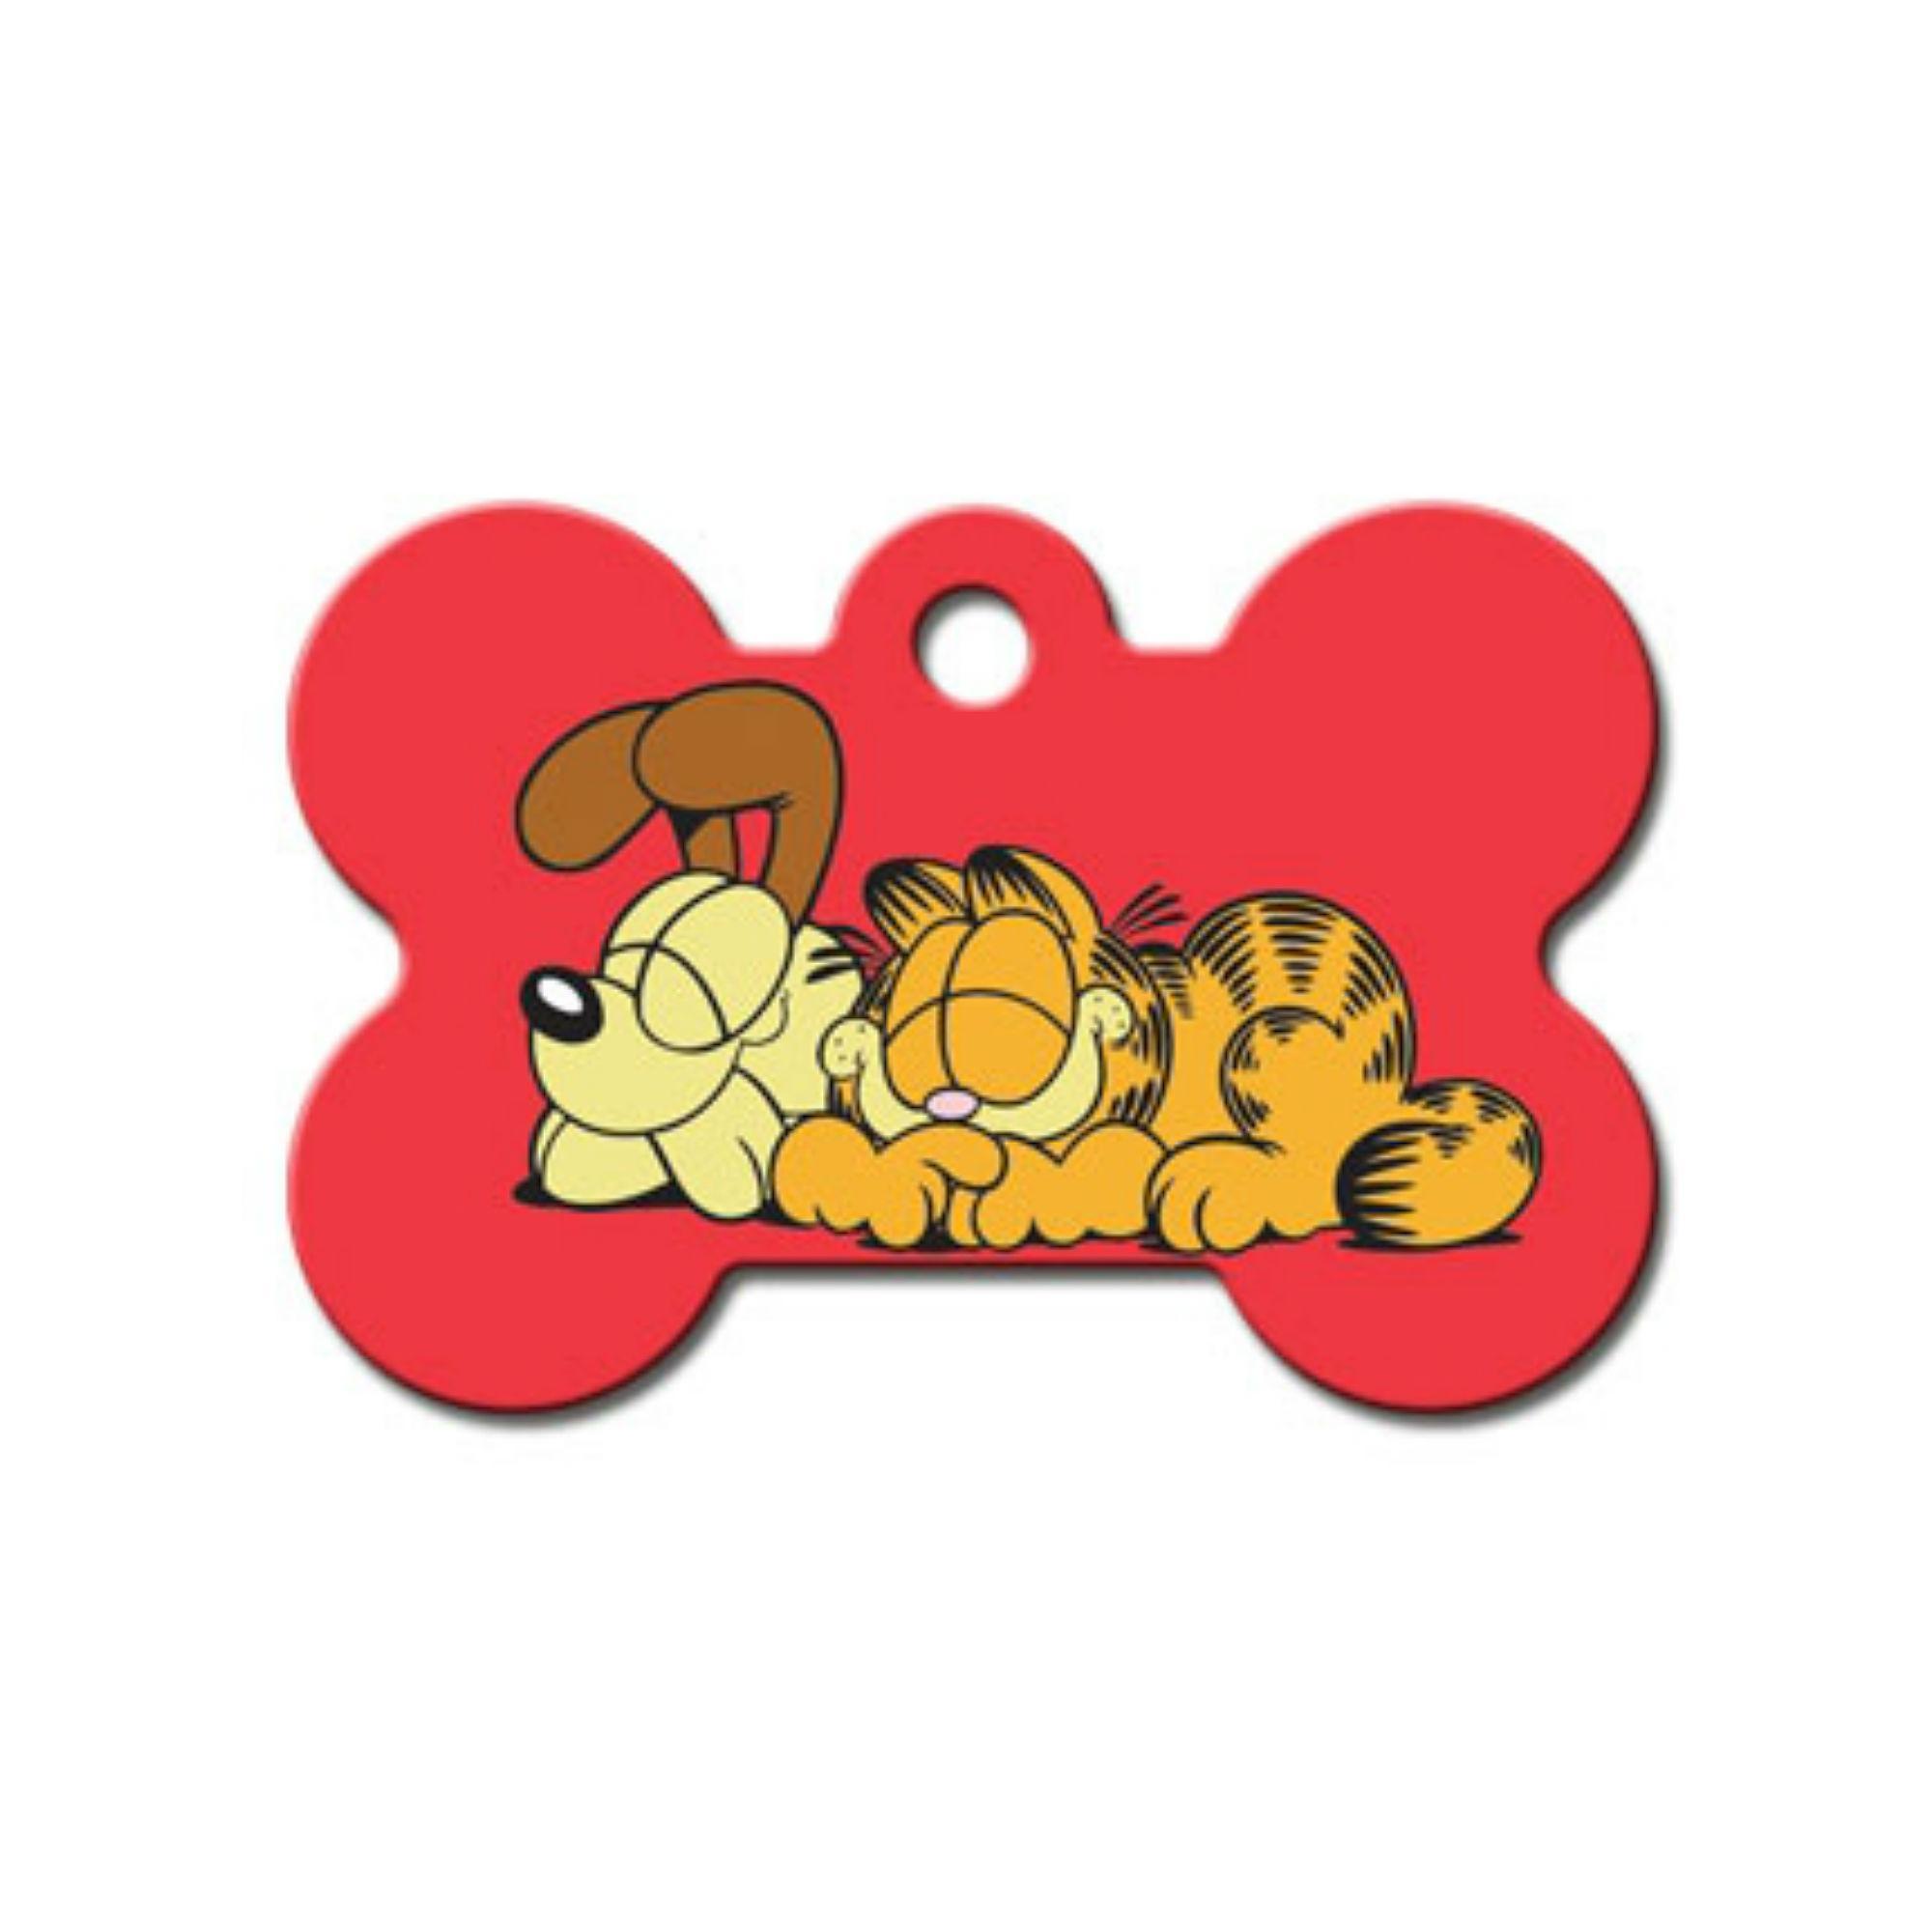 Garfield & Odie Bone Large Engravable Pet I.D. Tag